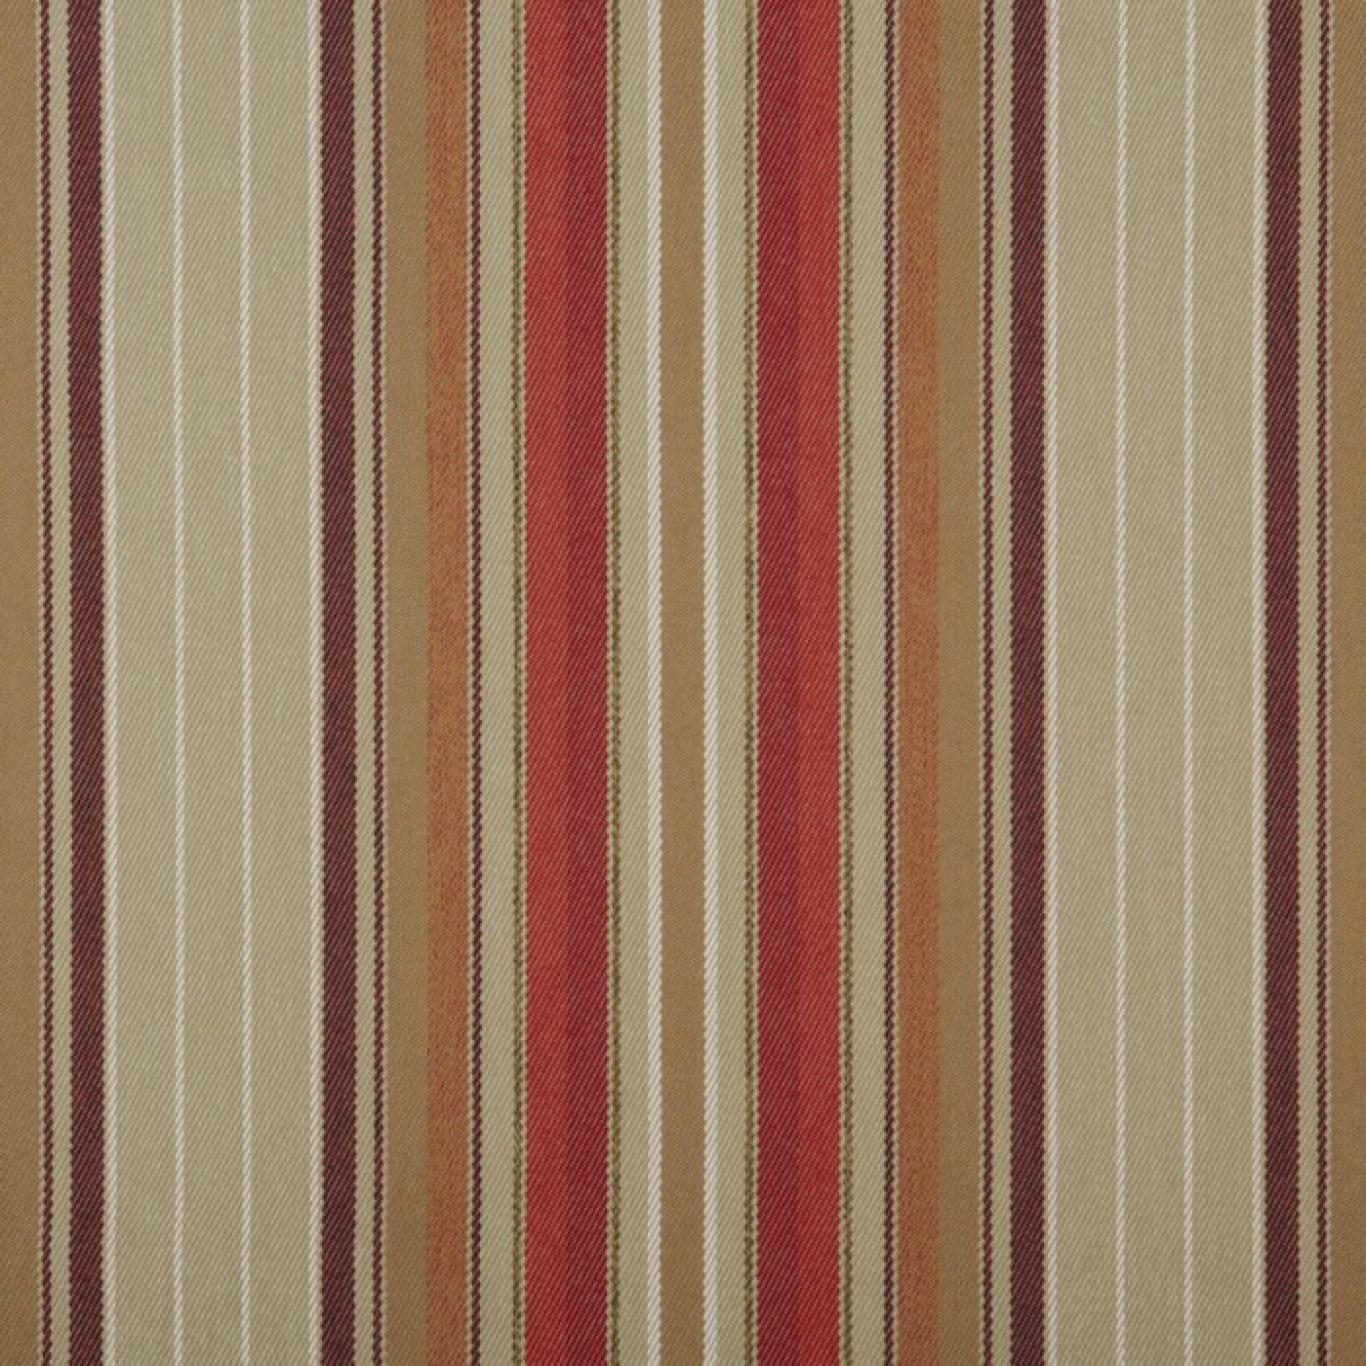 Image of Prestigious Braemar Cardinal Fabric